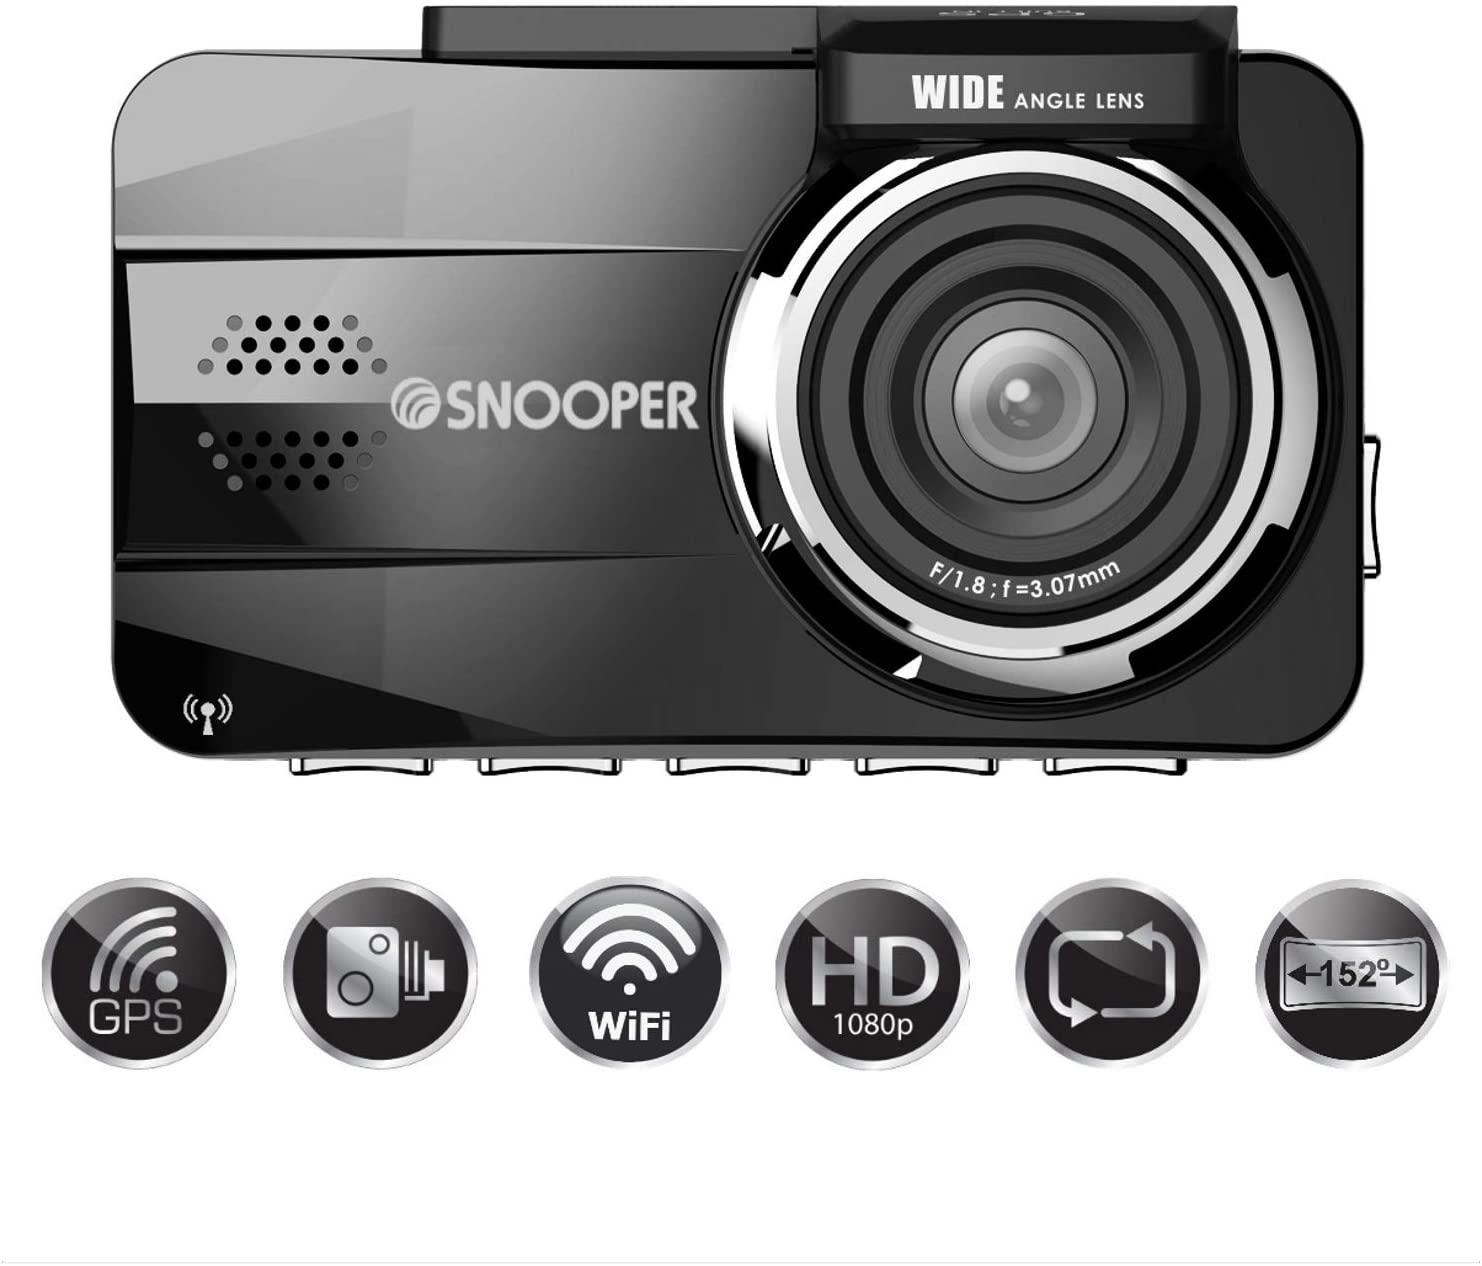 Snooper DVR-4HD G3 1080p HD GPS Dash Camera with Speed Alerts